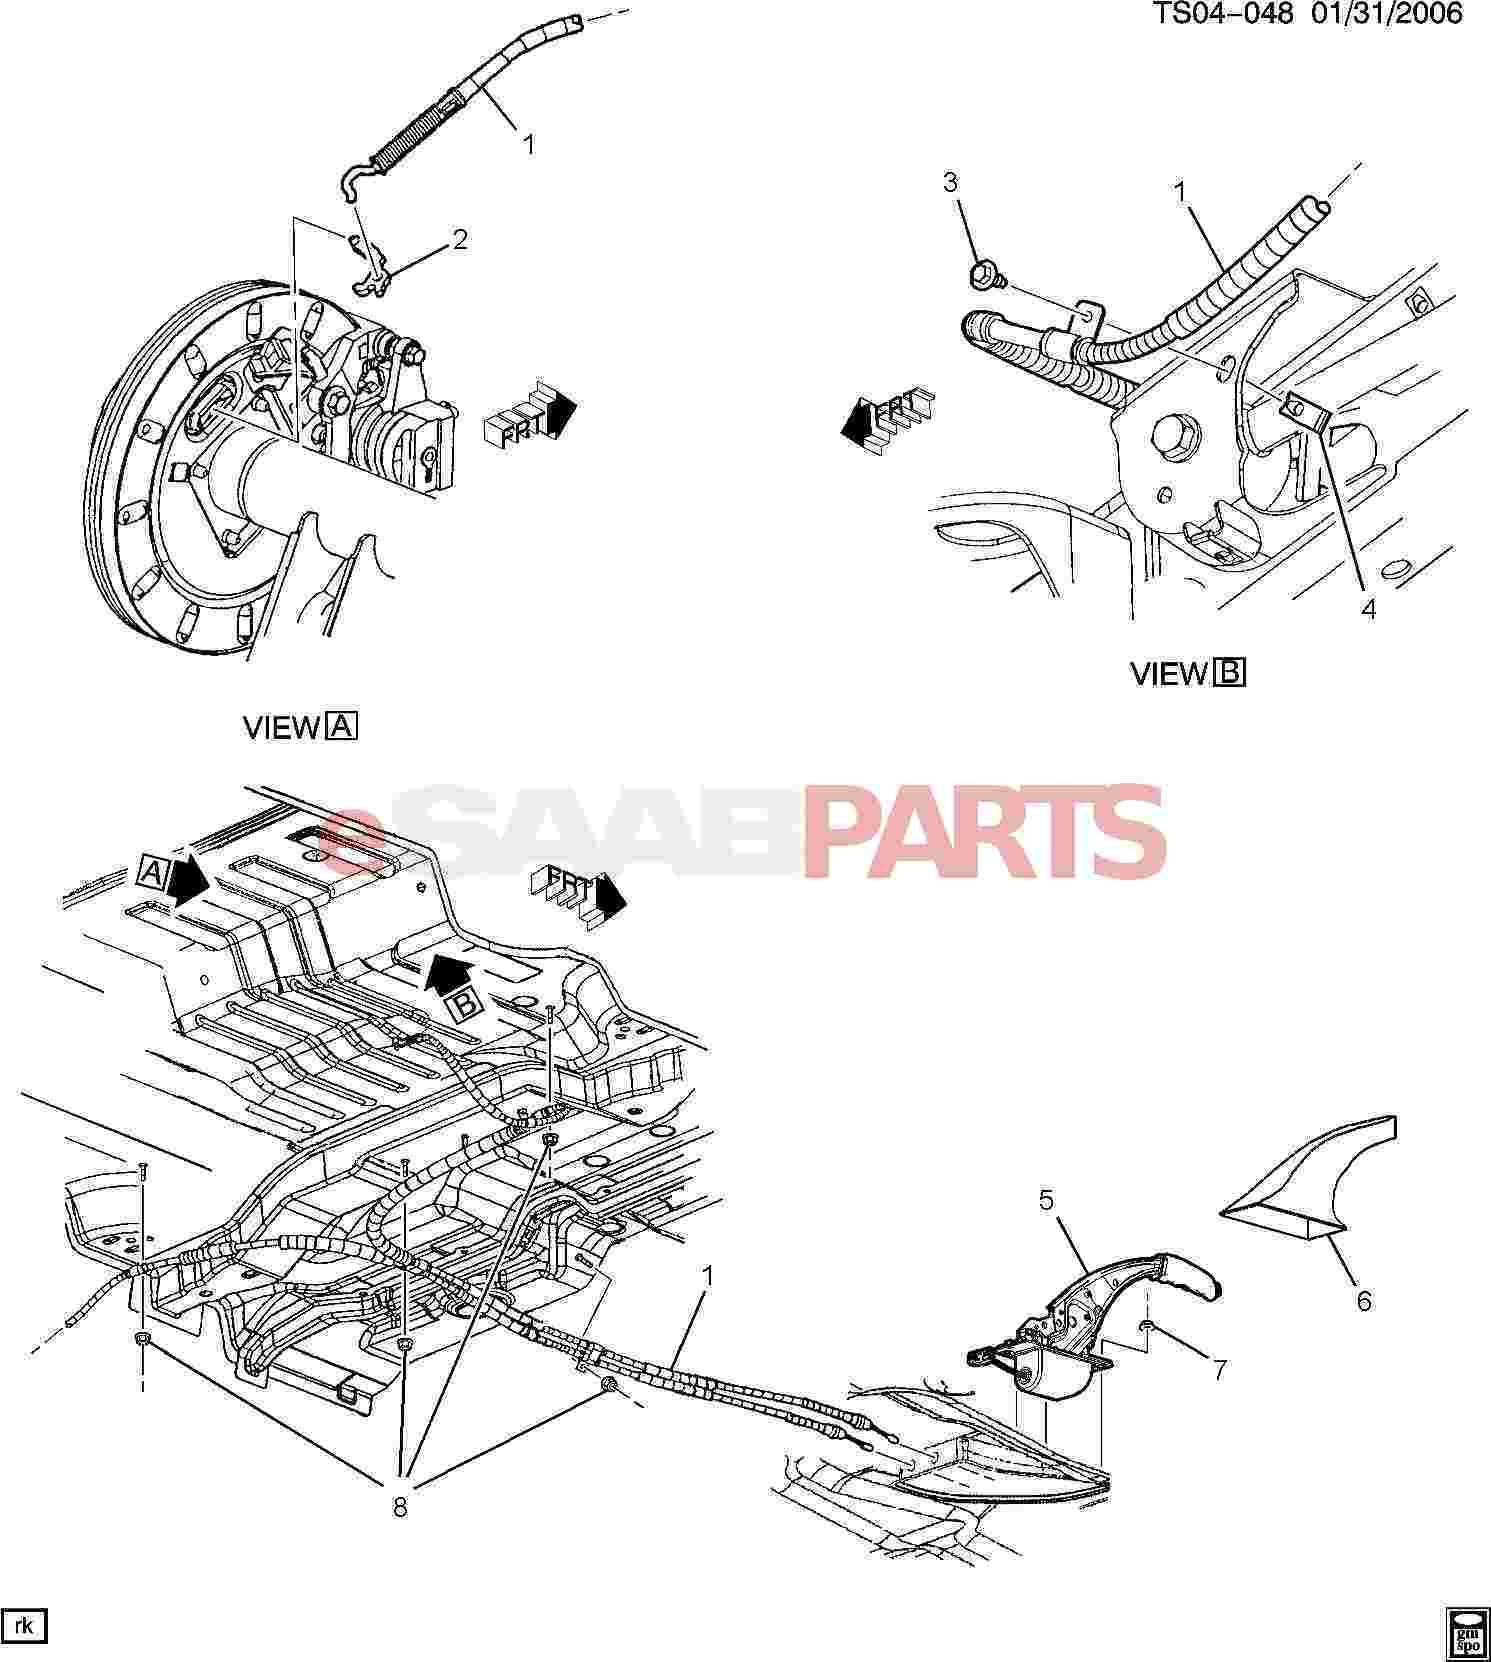 Saab 9 7x Brakes Parts Parking Brake Diagram System